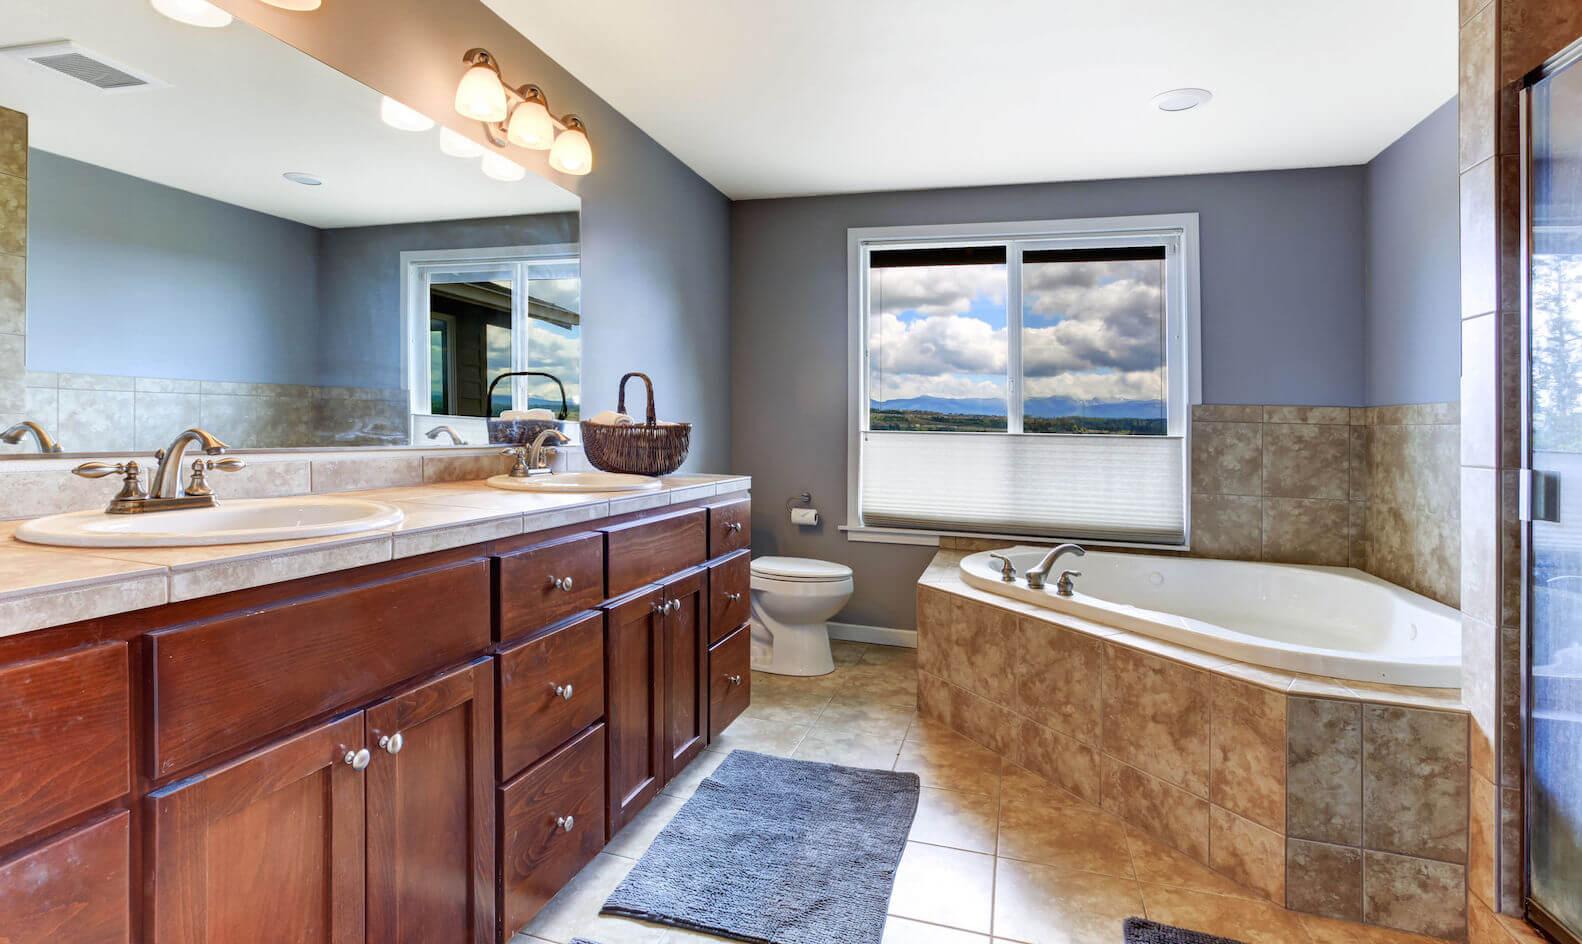 Bathroom Remodel Questionnaire calgary renovation contractors 403-991-5152